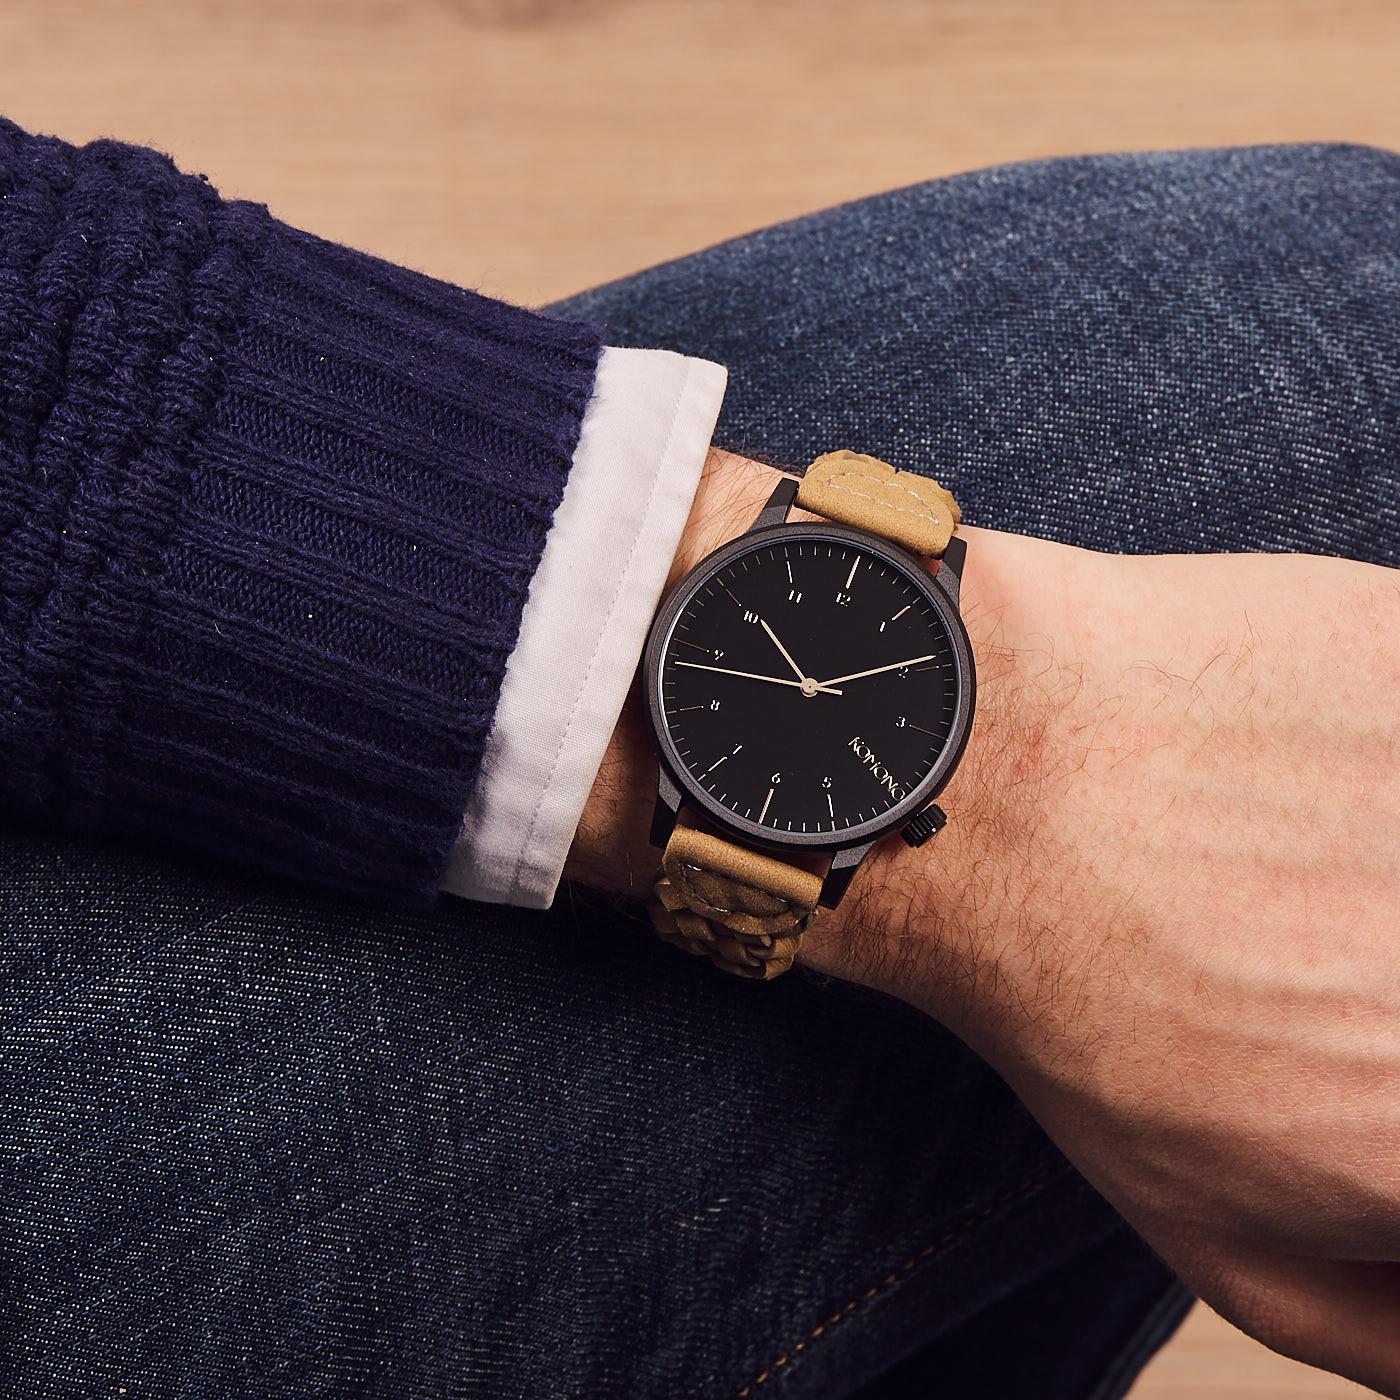 e83f154d851 Komono Winston Woven Cobblestone Watch KOM-W2036 - Watches